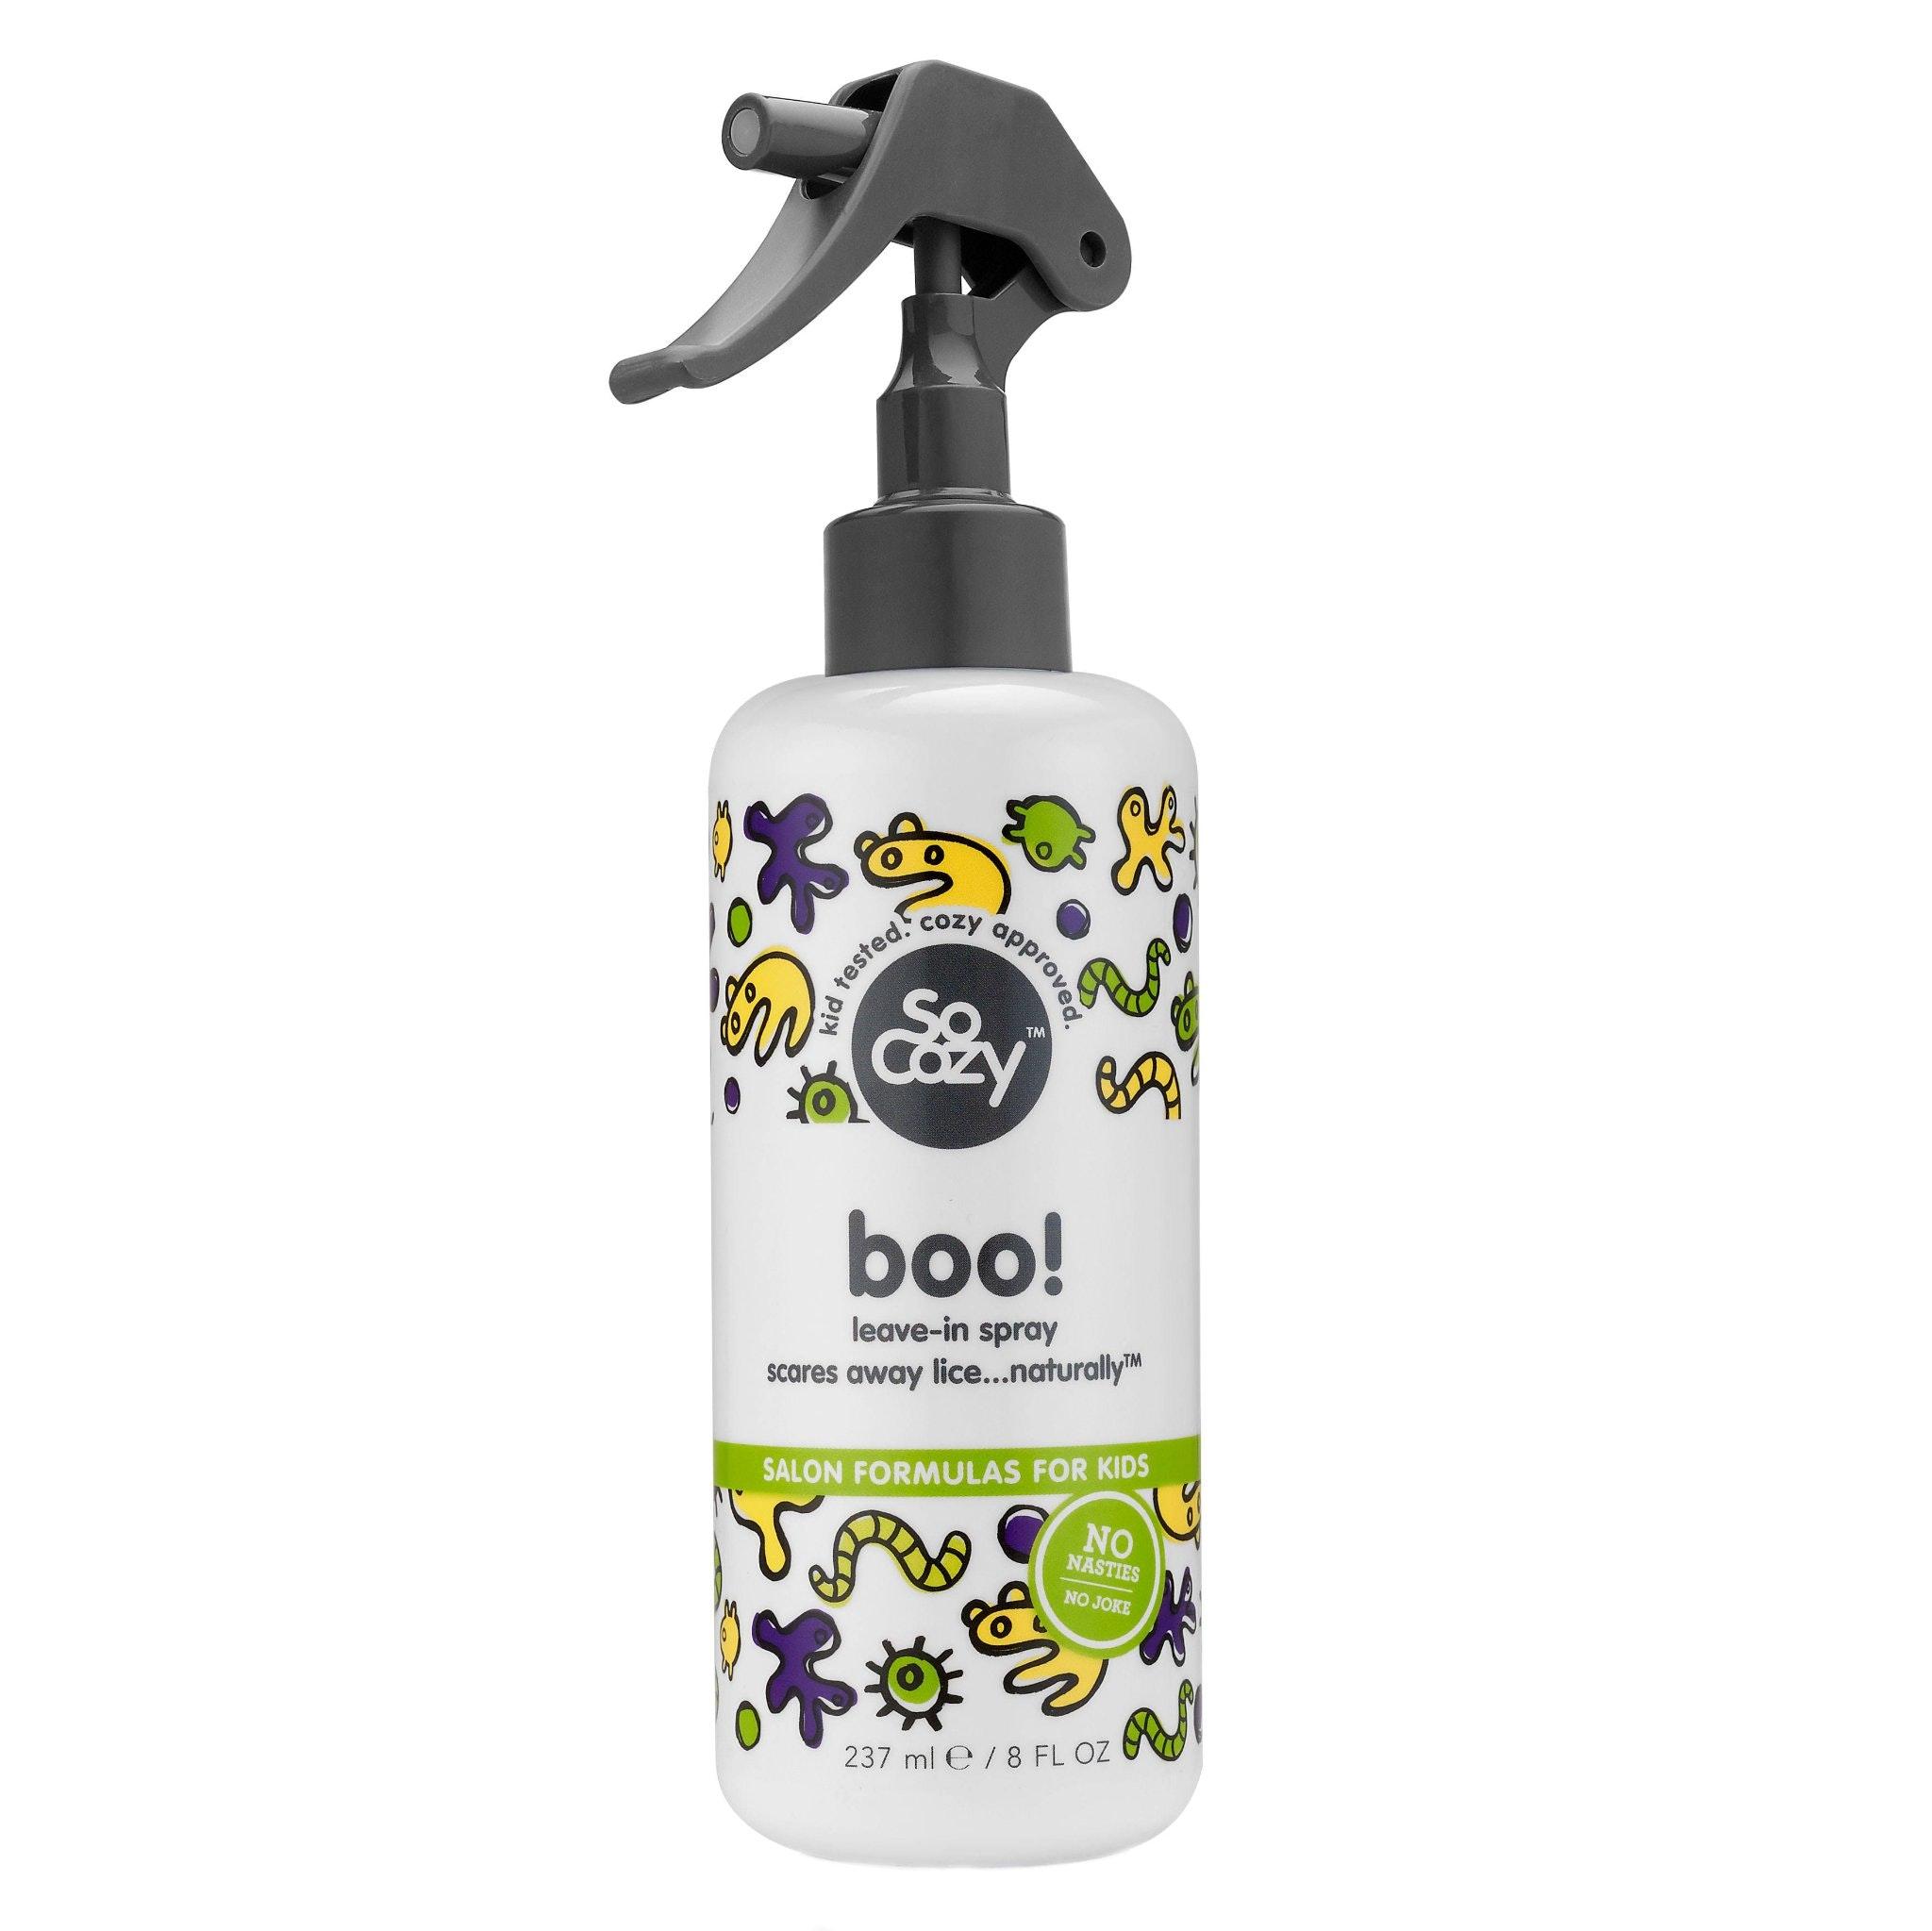 Boo! Scare Lice Leave in Spray